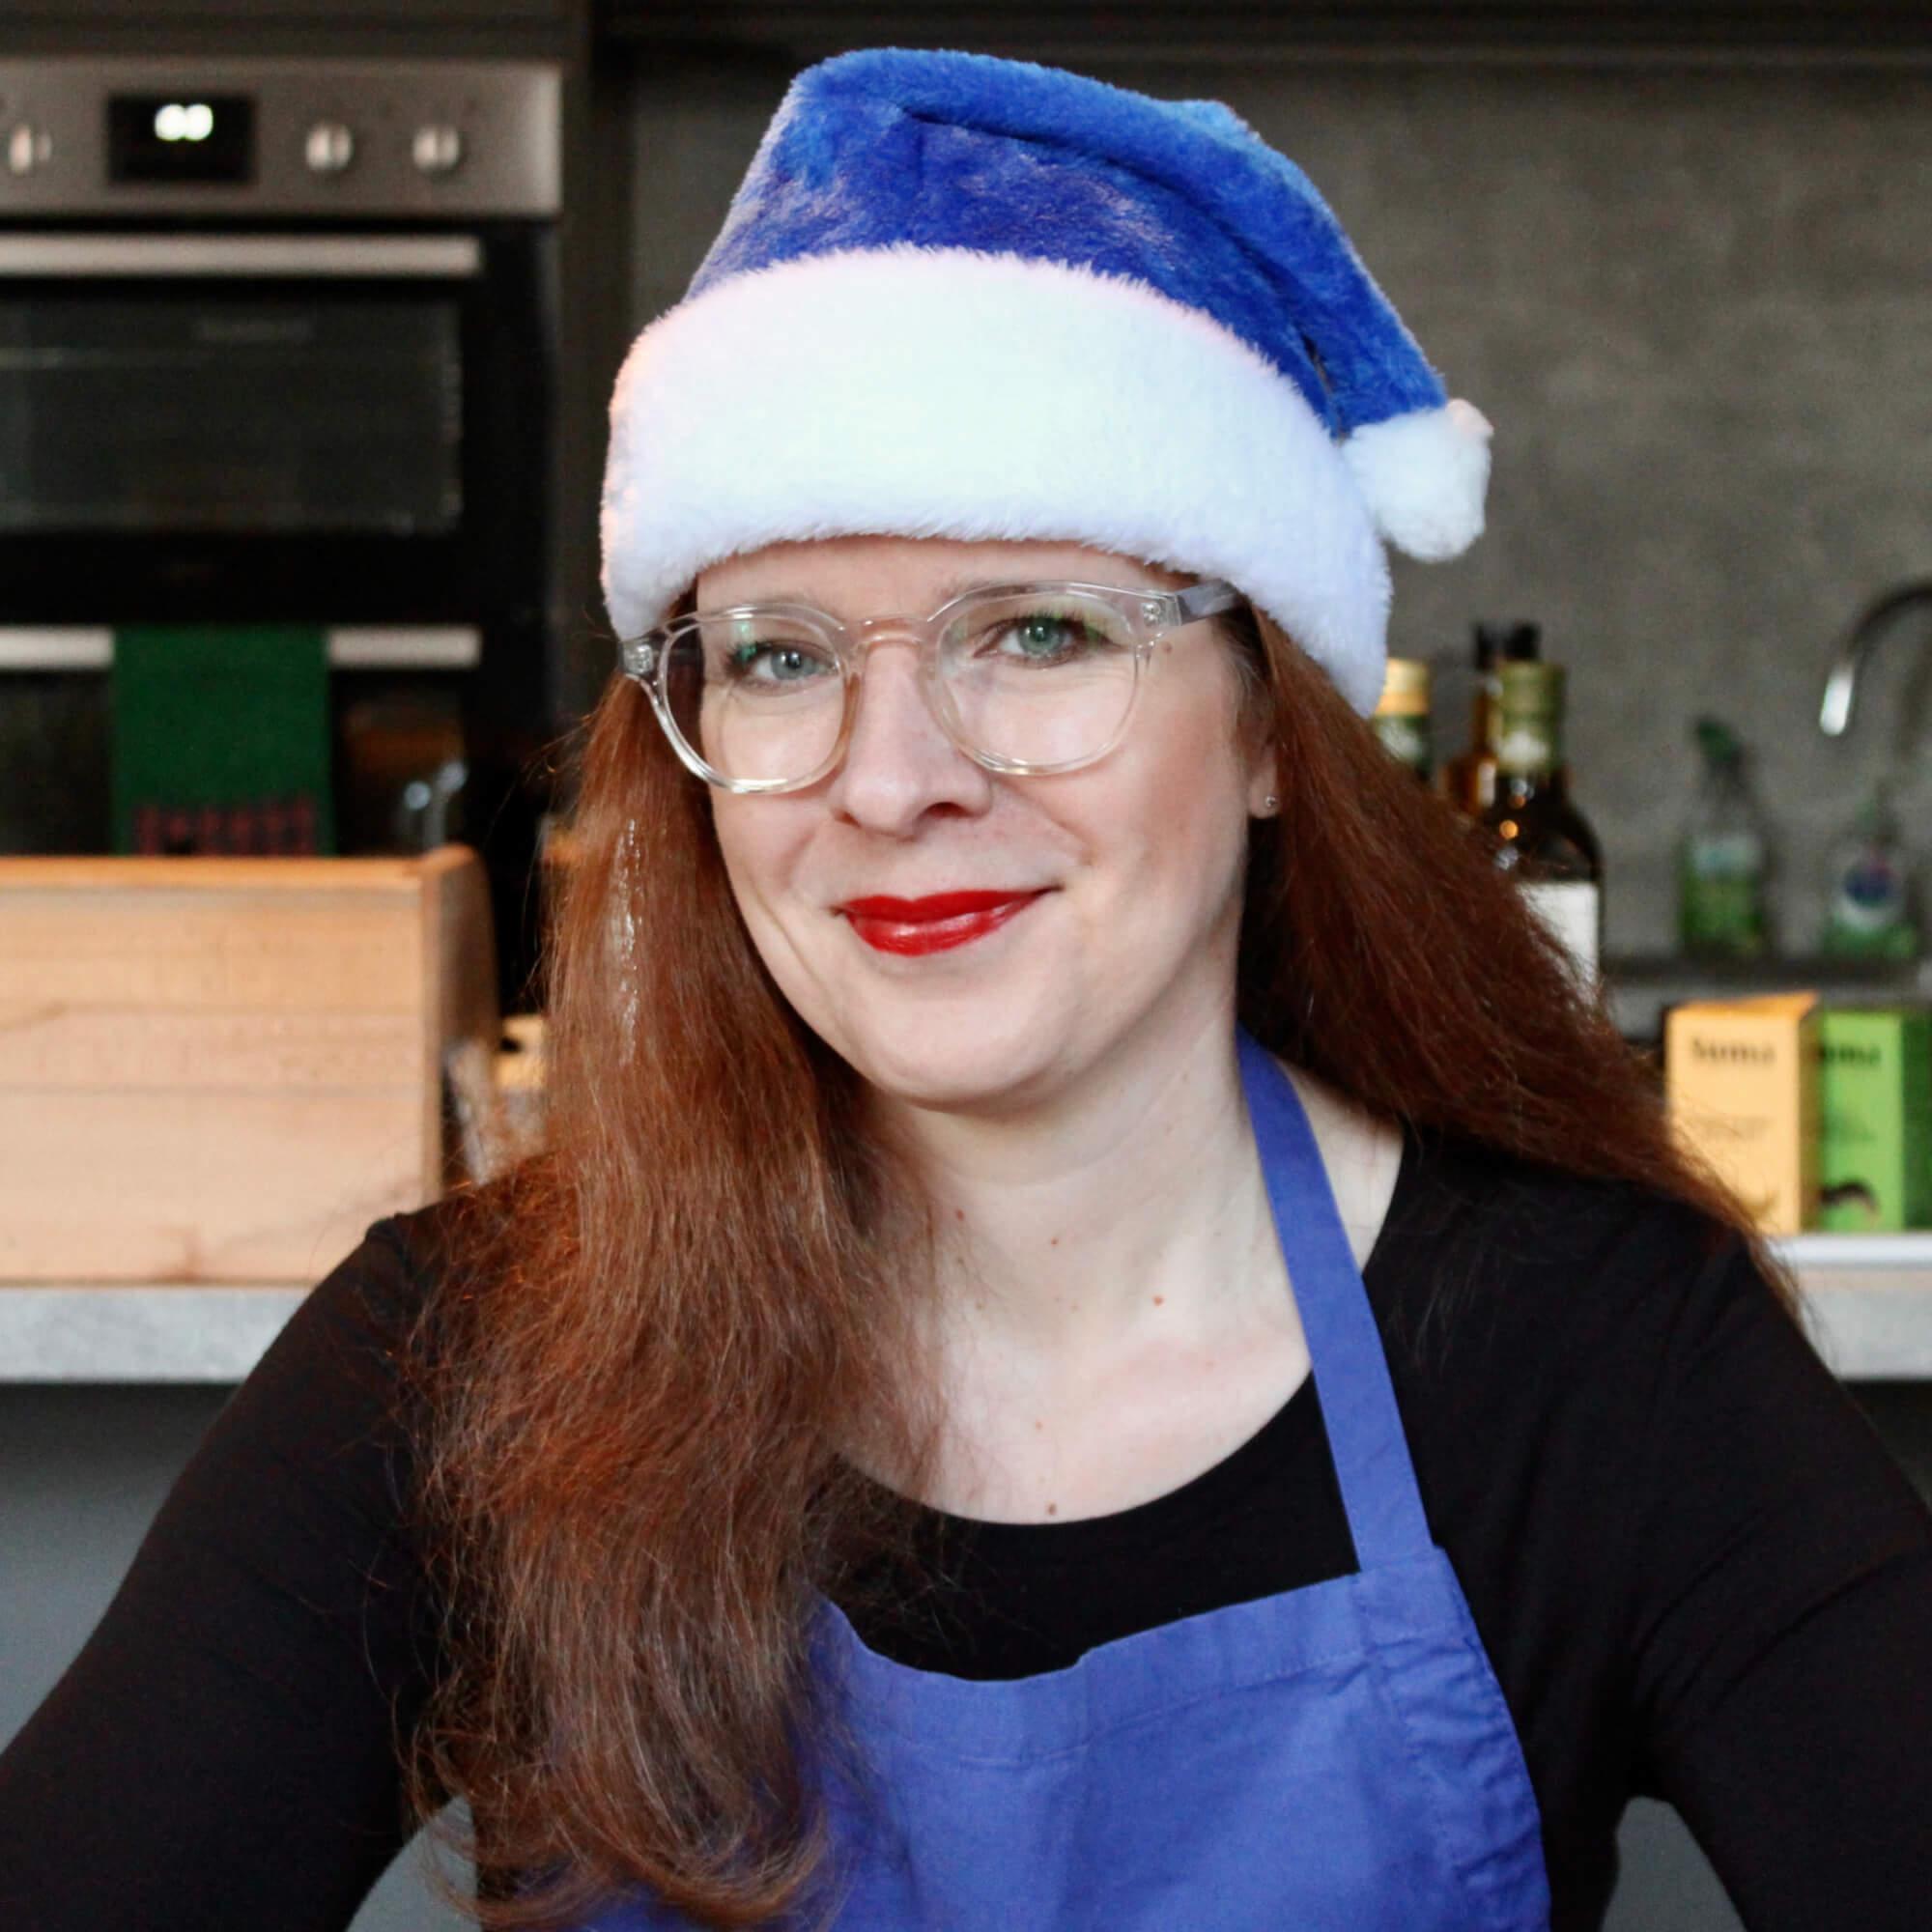 Tanja Bueltmann EU Citizens' Champion Baked-in European fundraising stylerebelles